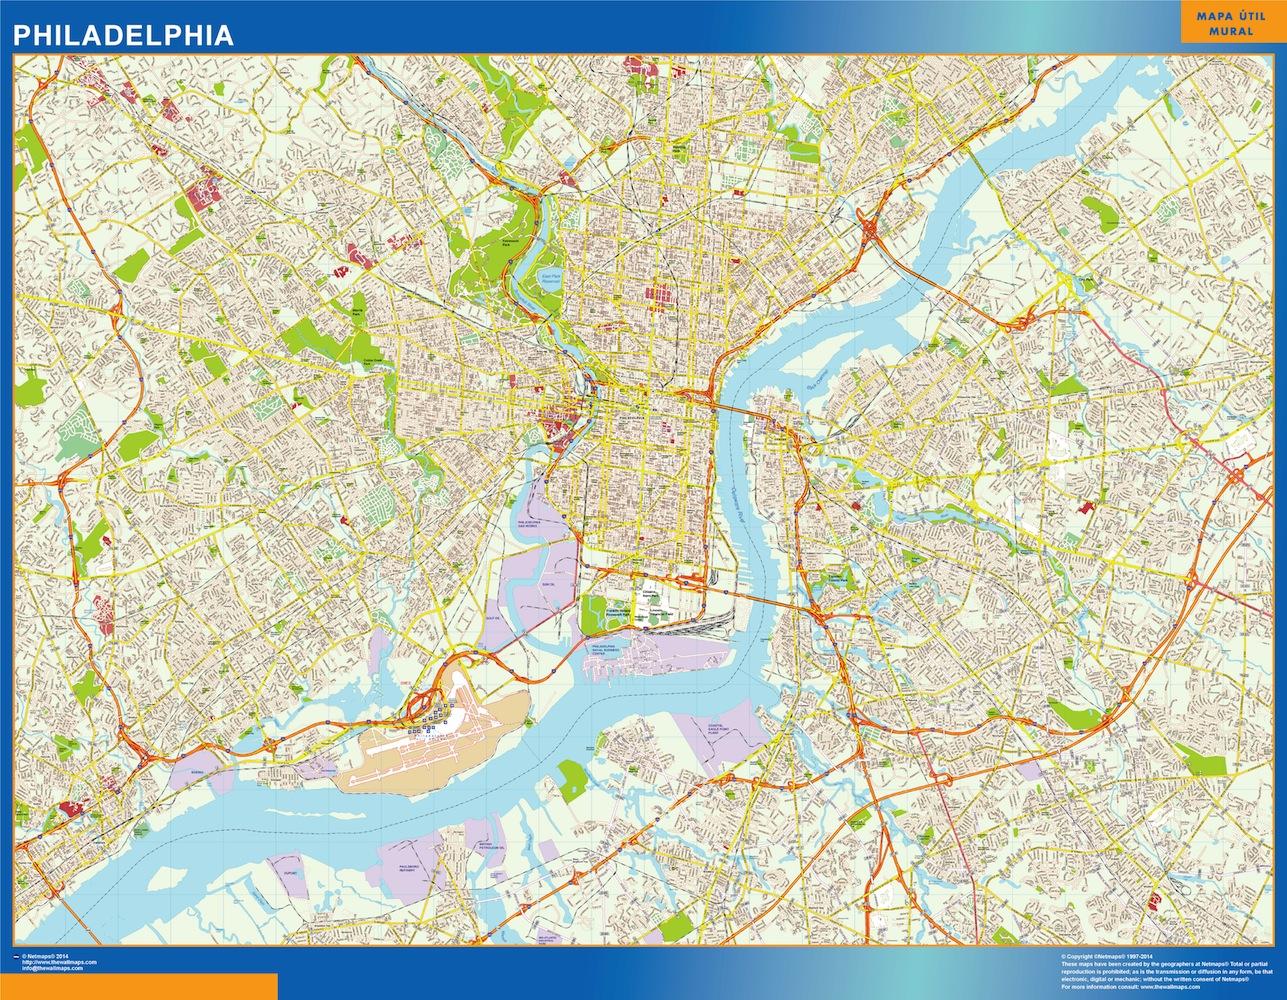 Mapa de Filadelfia plastificado gigante